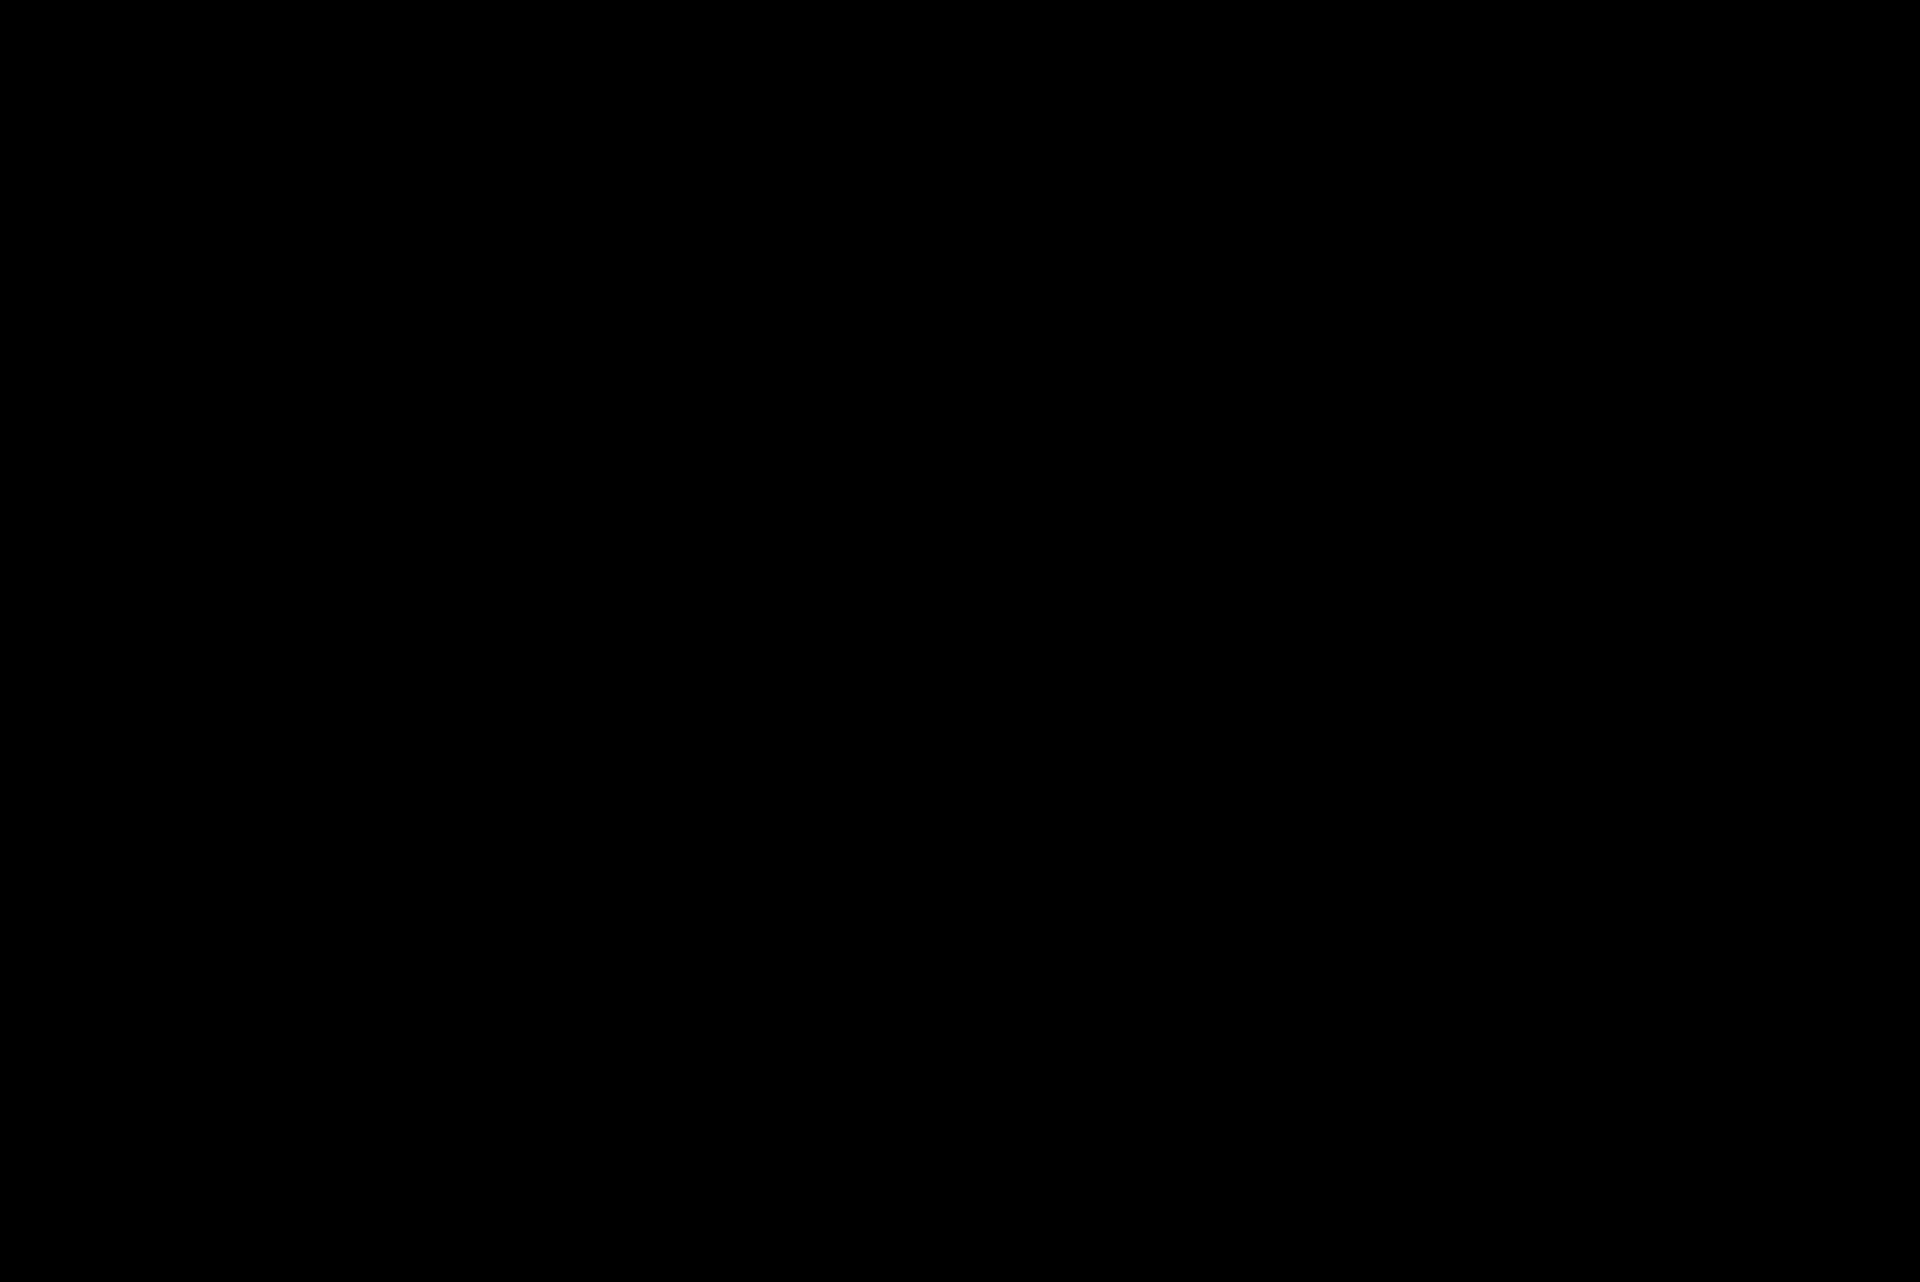 test-image-4